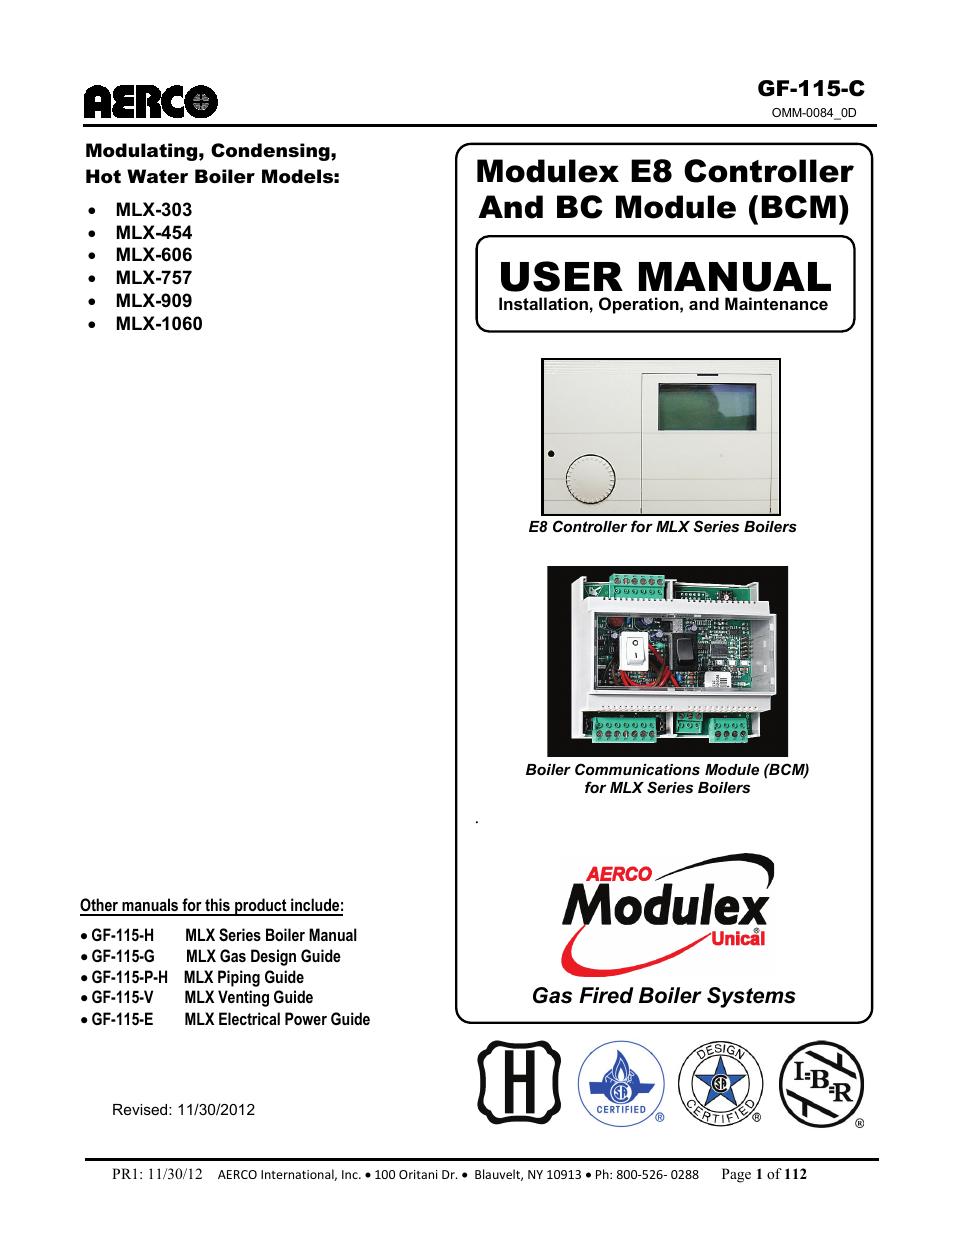 aerco modulex e8 controls guide user manual 112 pages rh manualsdir com Boiler Control Wiring Gas Boiler Wiring